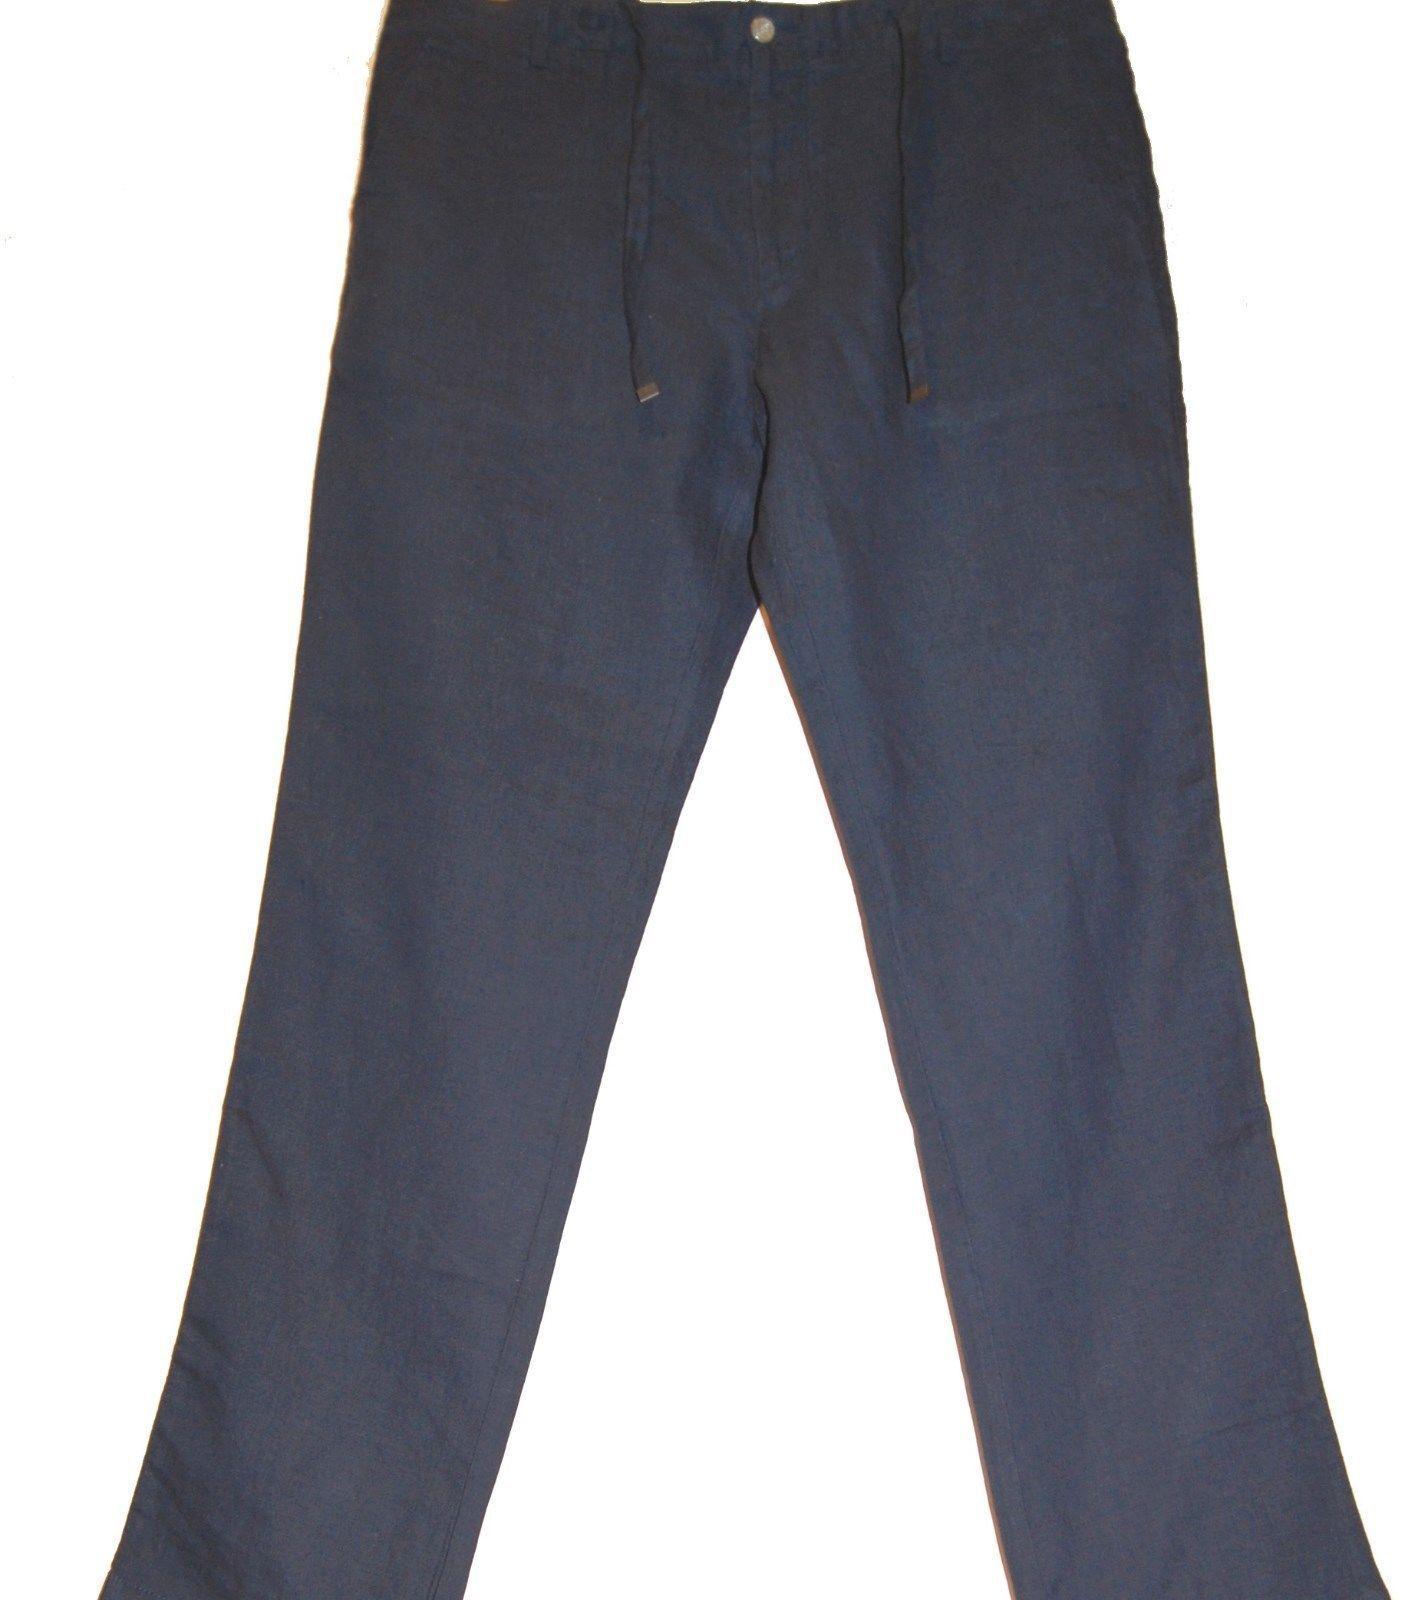 Hugo Boss Navy bluee Men's Linen Stylish Trosure Pants Size US 38 R NEW